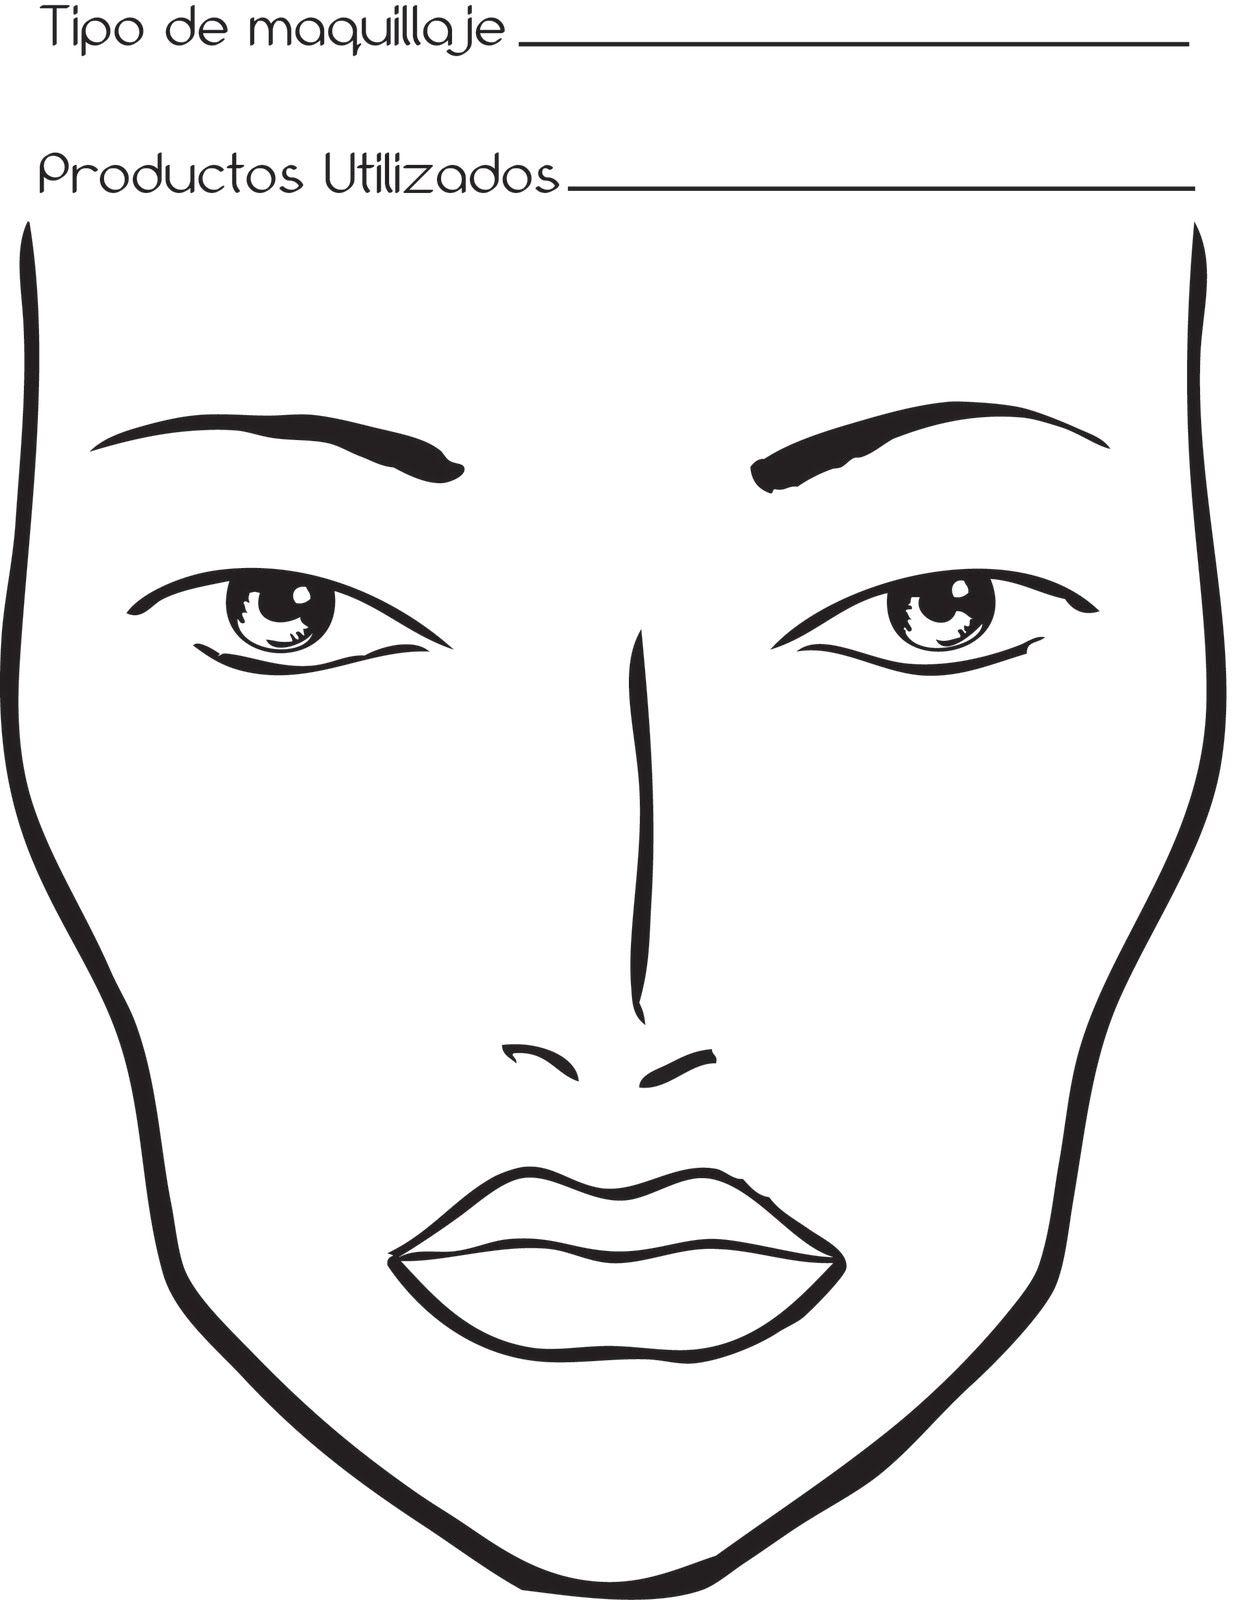 Bocetos Rostros Para Maquillar Libros De Maquillaje Gaficos De La Cara Dibujos De Maquillaje